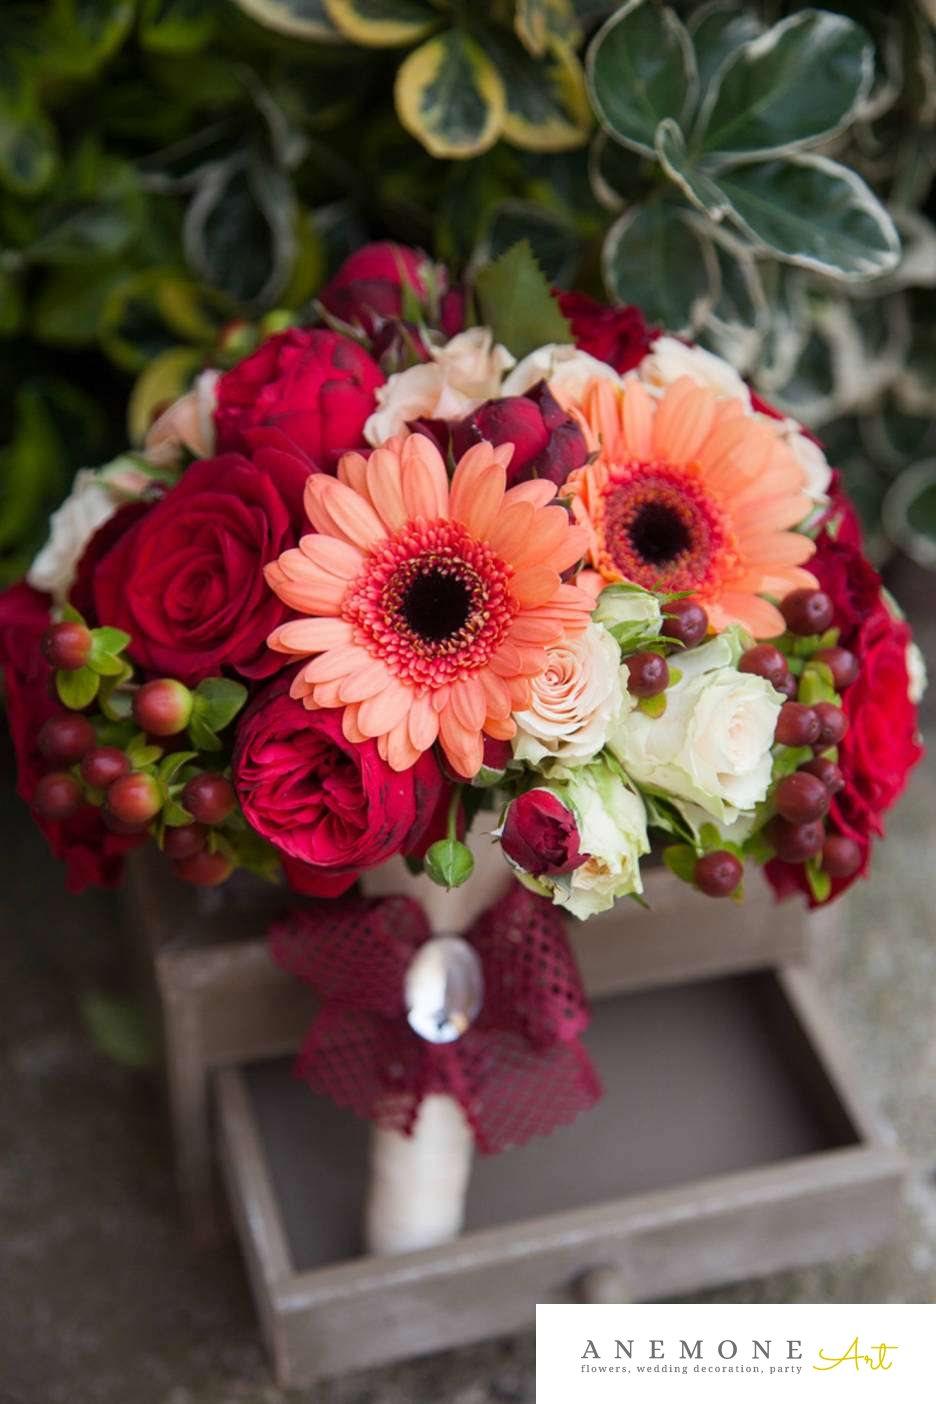 Poza, foto cu Flori de nunta buchet mireasa, gerbera, macese, mini-rosa, piersica, rosu, rotund, trandafiri, visiniu in Arad, Timisoara, Oradea (wedding flowers, bouquets) nunta Arad, Timisoara, Oradea